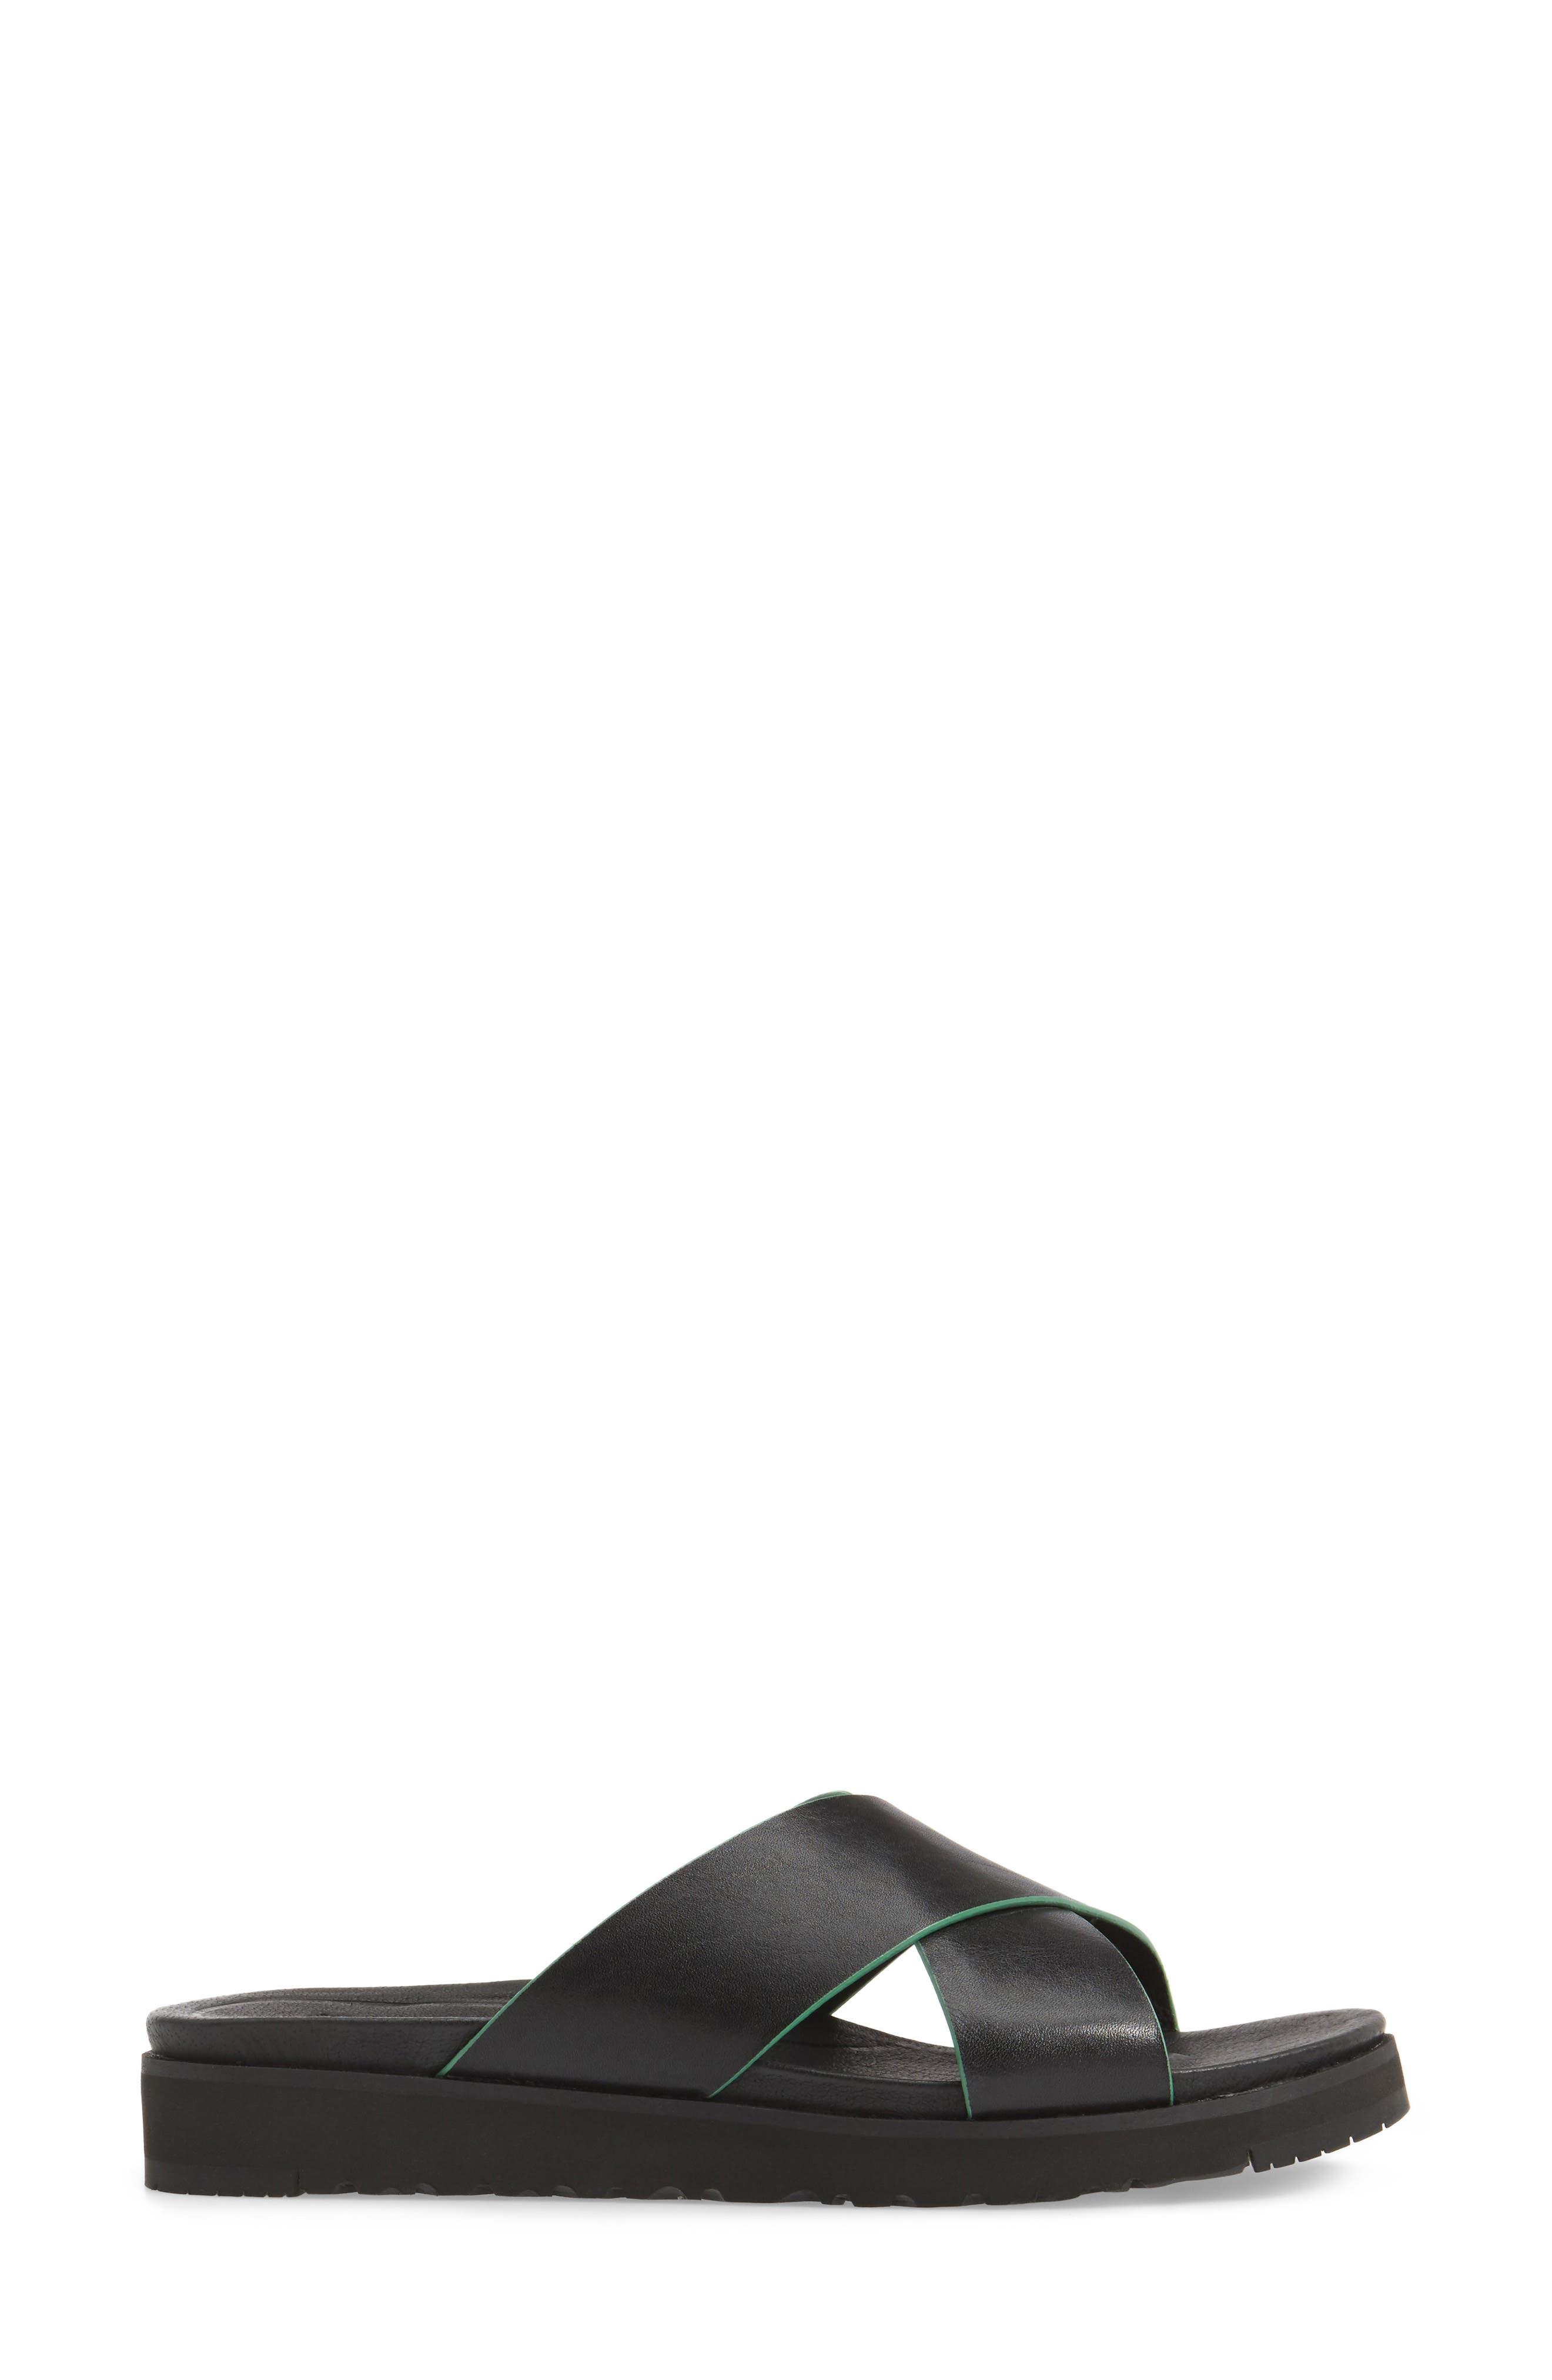 Alternate Image 3  - UGG® 'Kari' Sandal (Women)